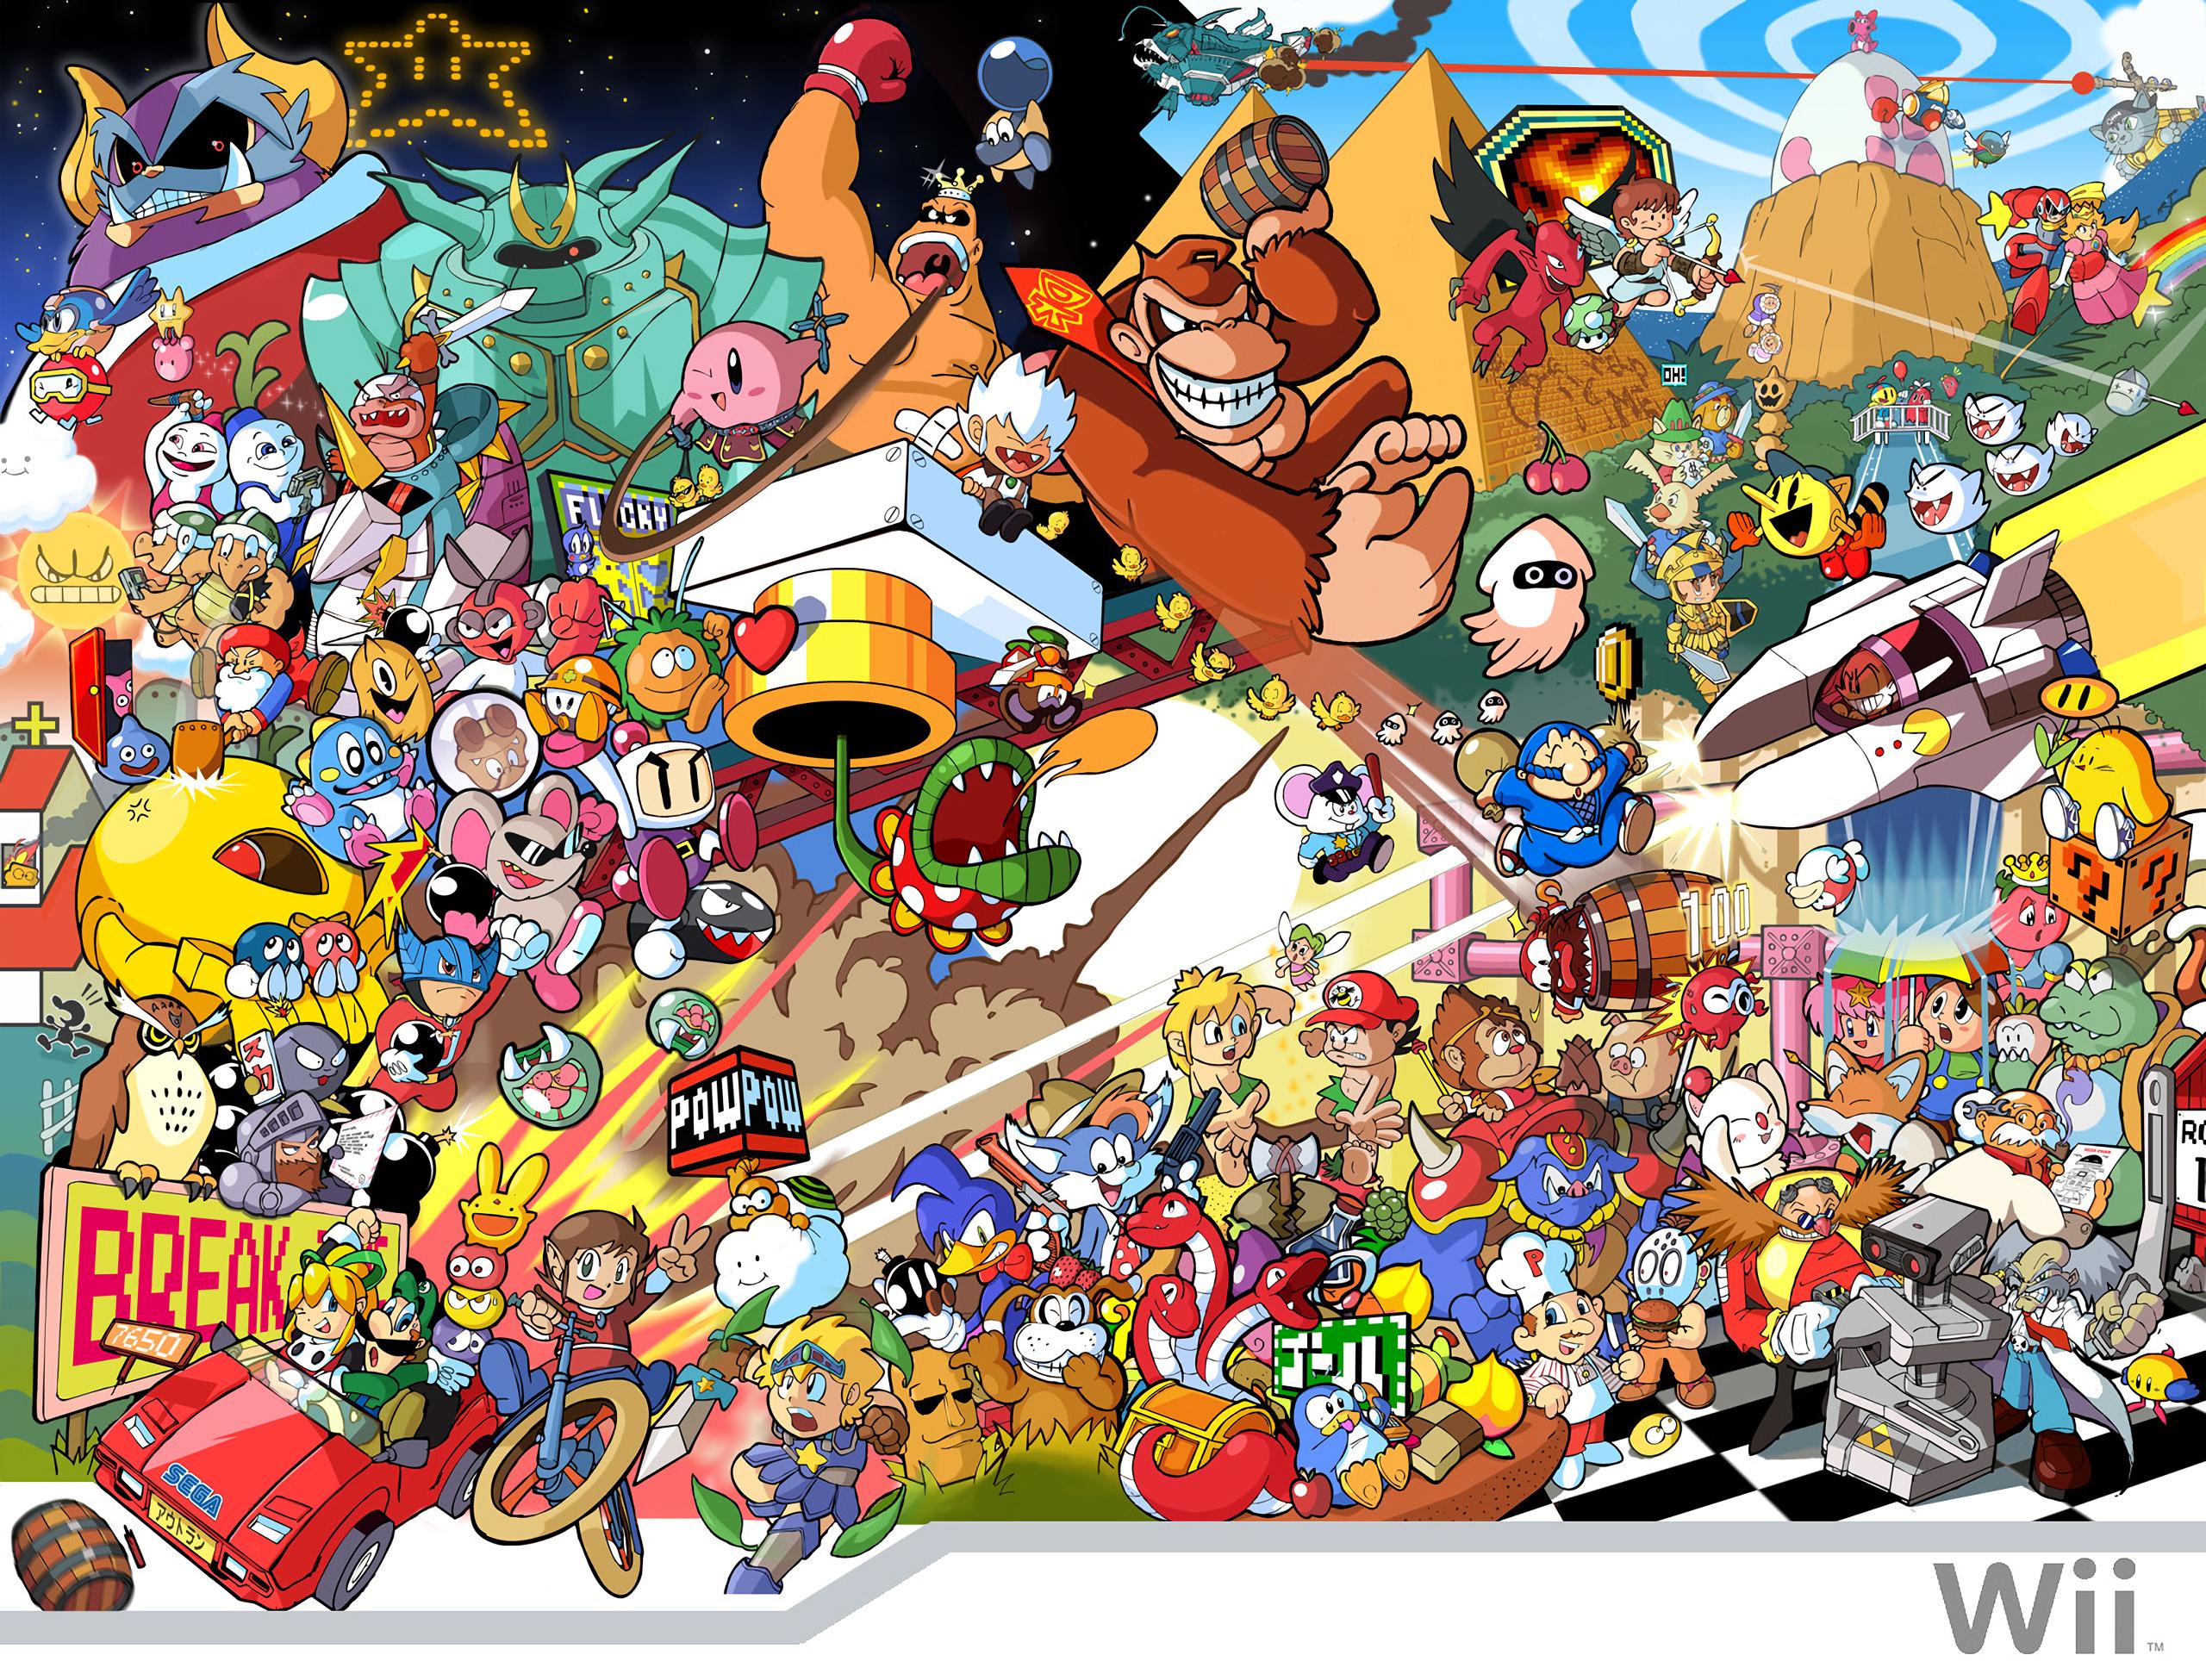 Nintendo hd wallpaper background image 2560x1950 id - Nes wallpaper ...